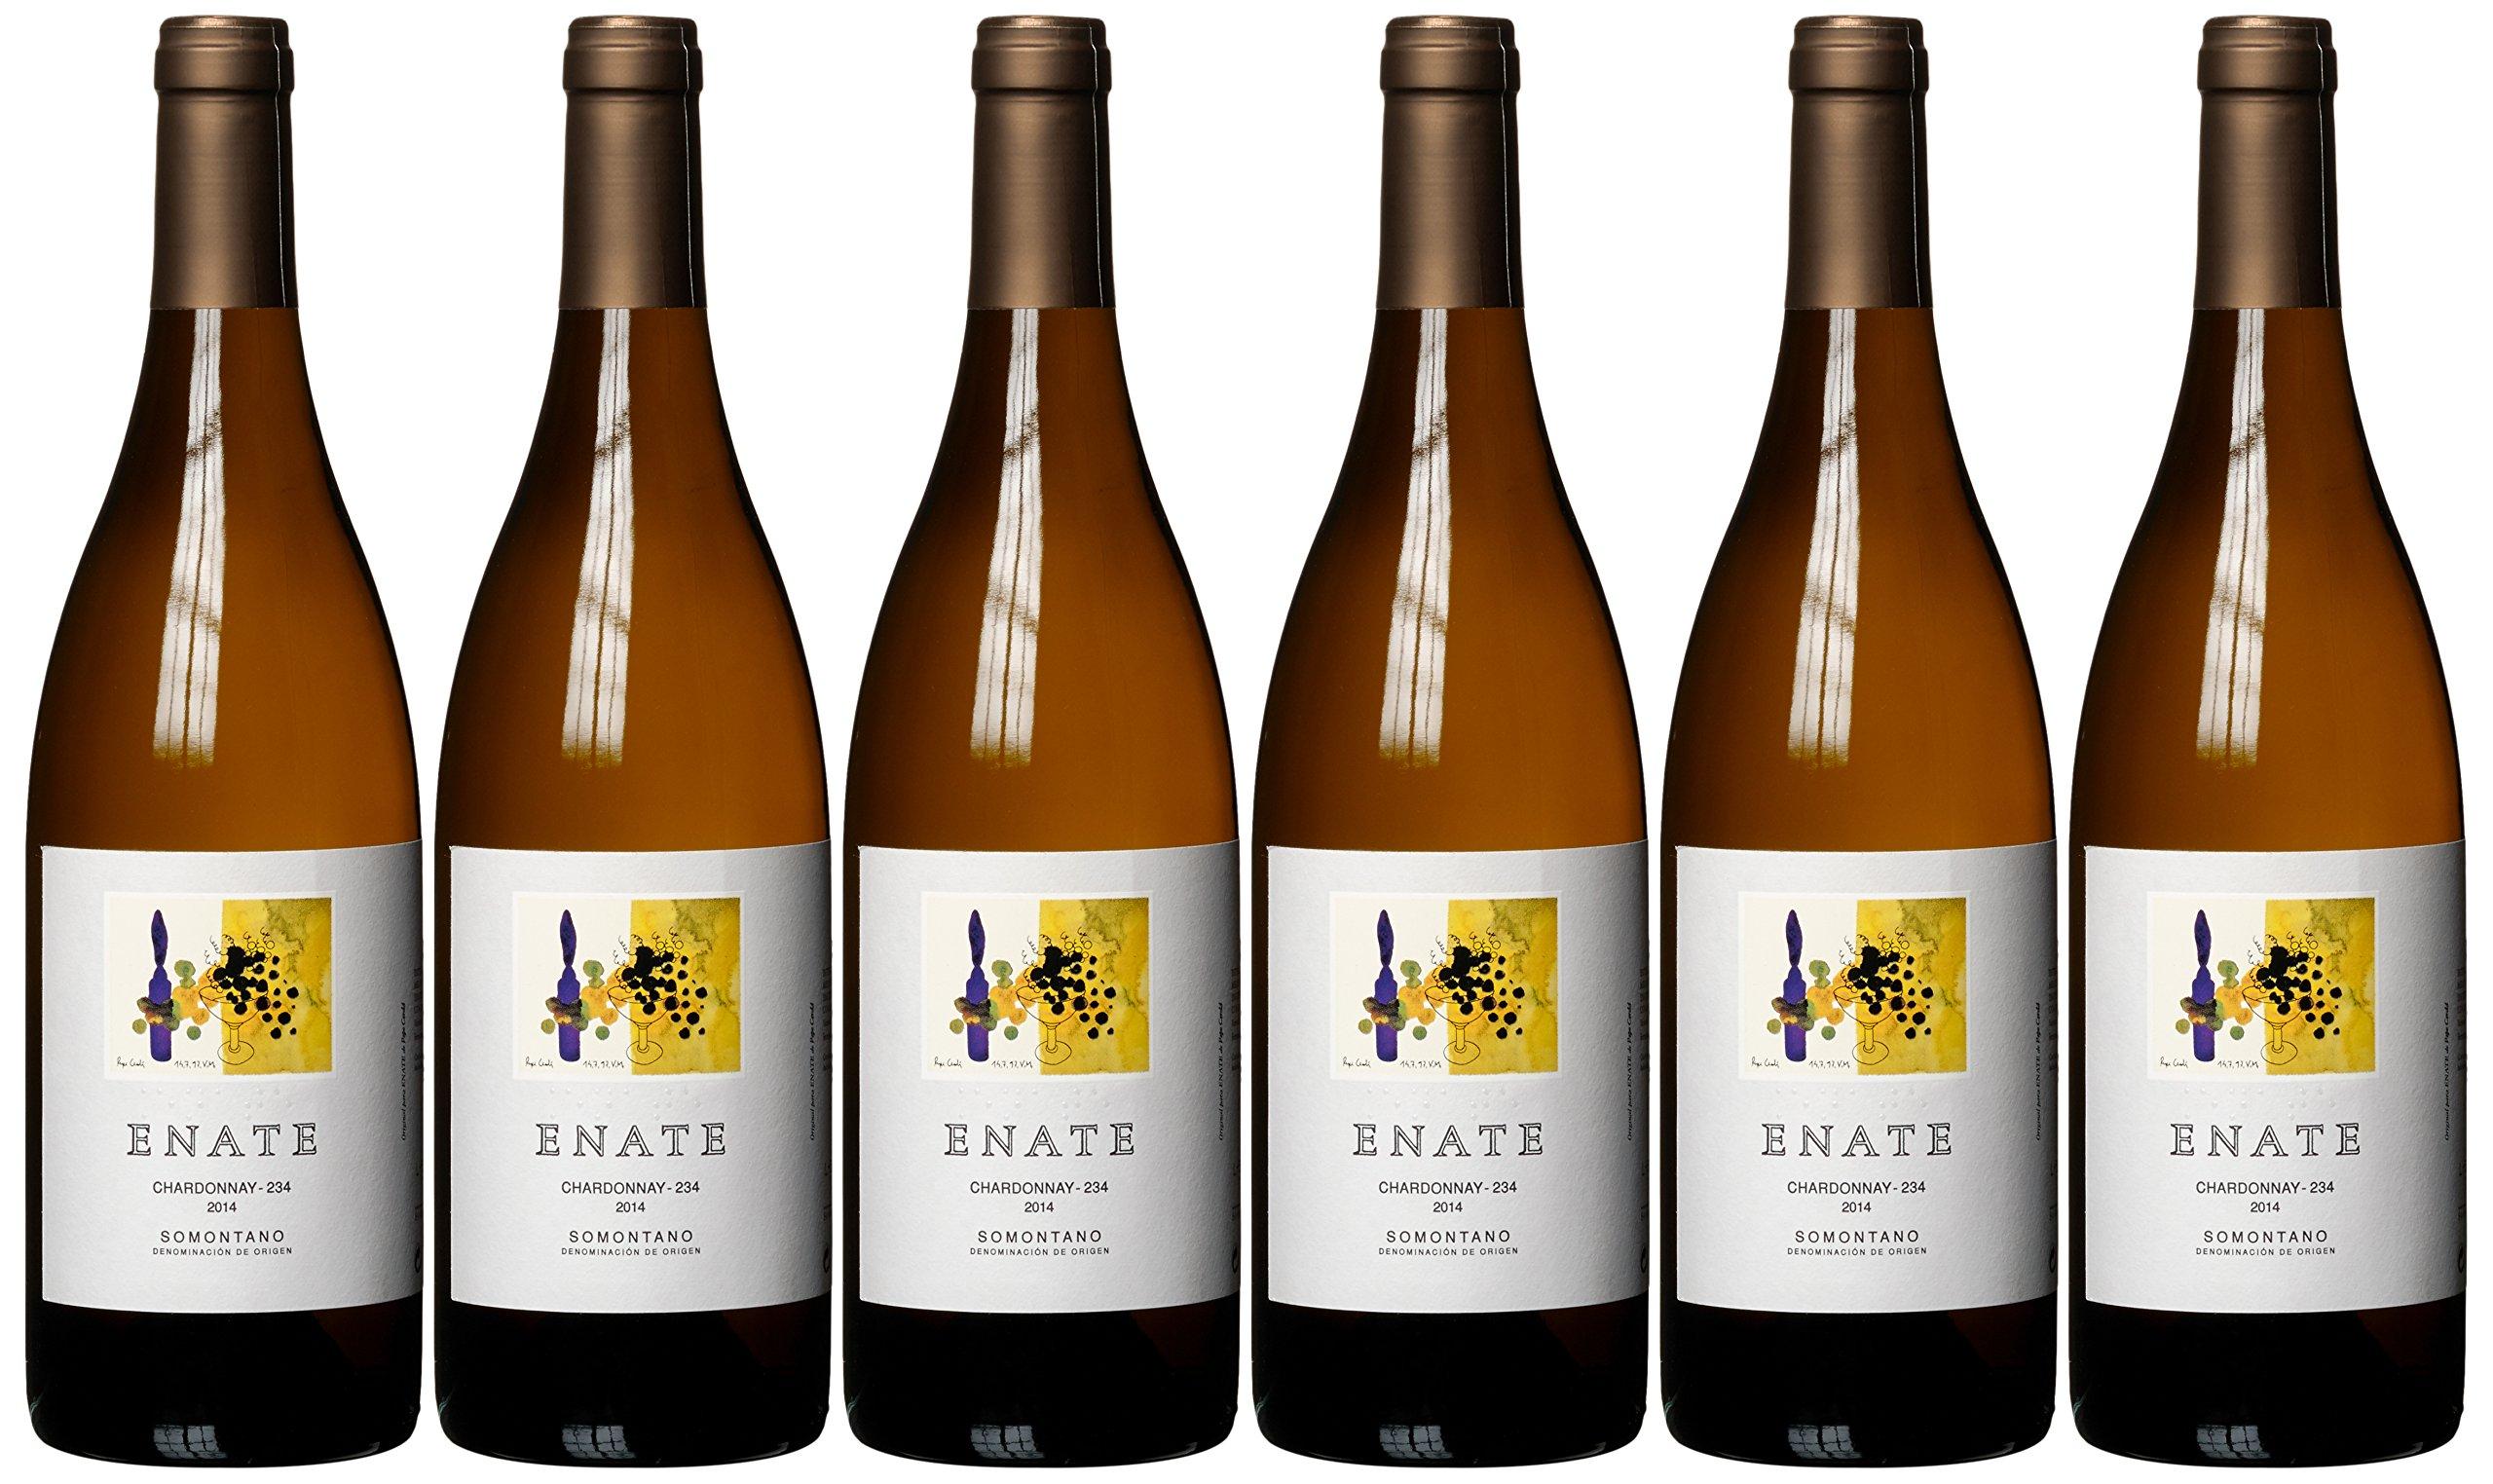 Enate chardonnay 234 - Vino Bianco- 6 Bottiglie